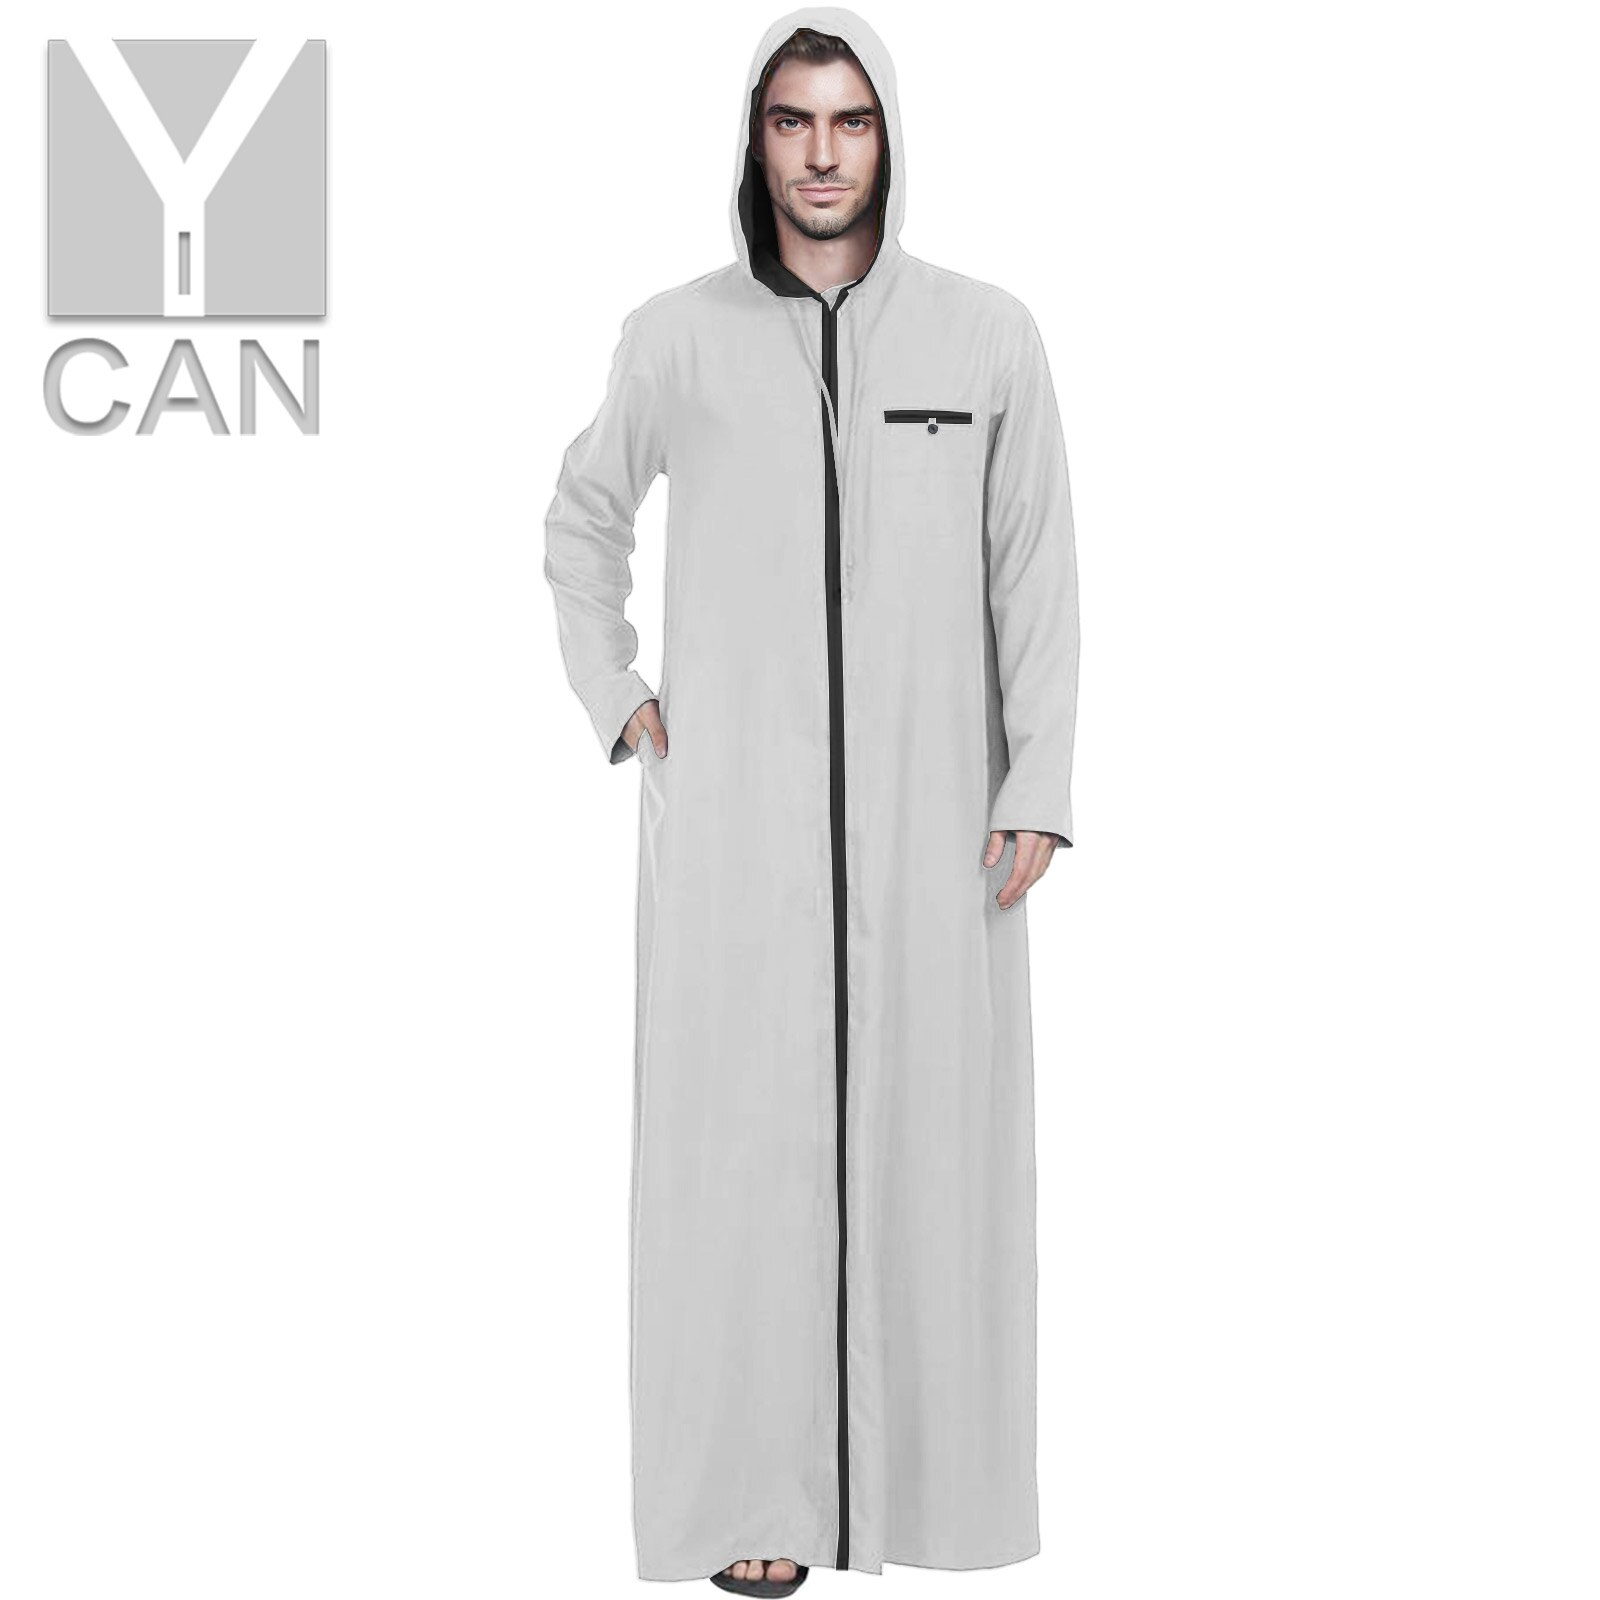 Y-CAN Islamic Pakistan Free Kaftan Muslim Fashion Clothing Long Sleeve Abaya Robes Hooded Saudi Arabia Dubai Jubba Thobe Y211001